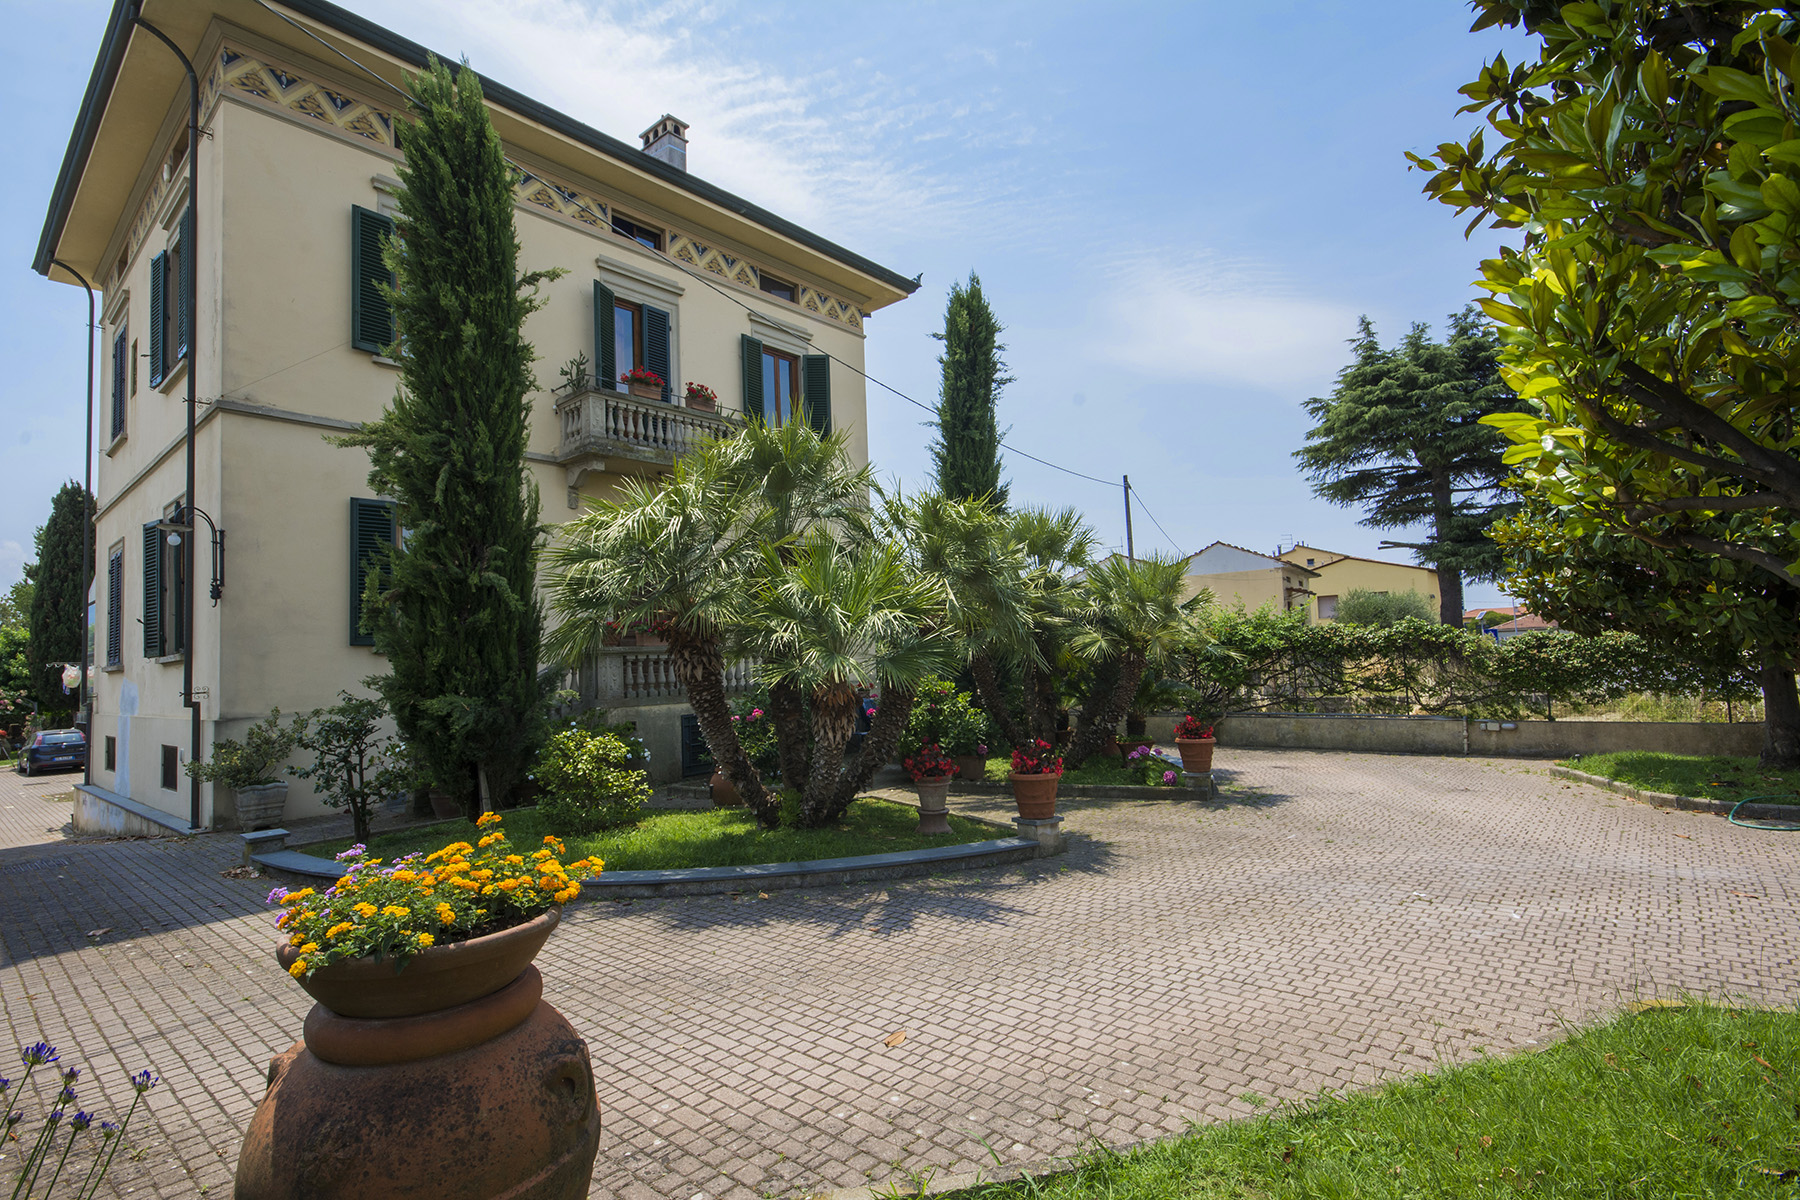 Villa in Vendita a Lucca: 5 locali, 500 mq - Foto 1